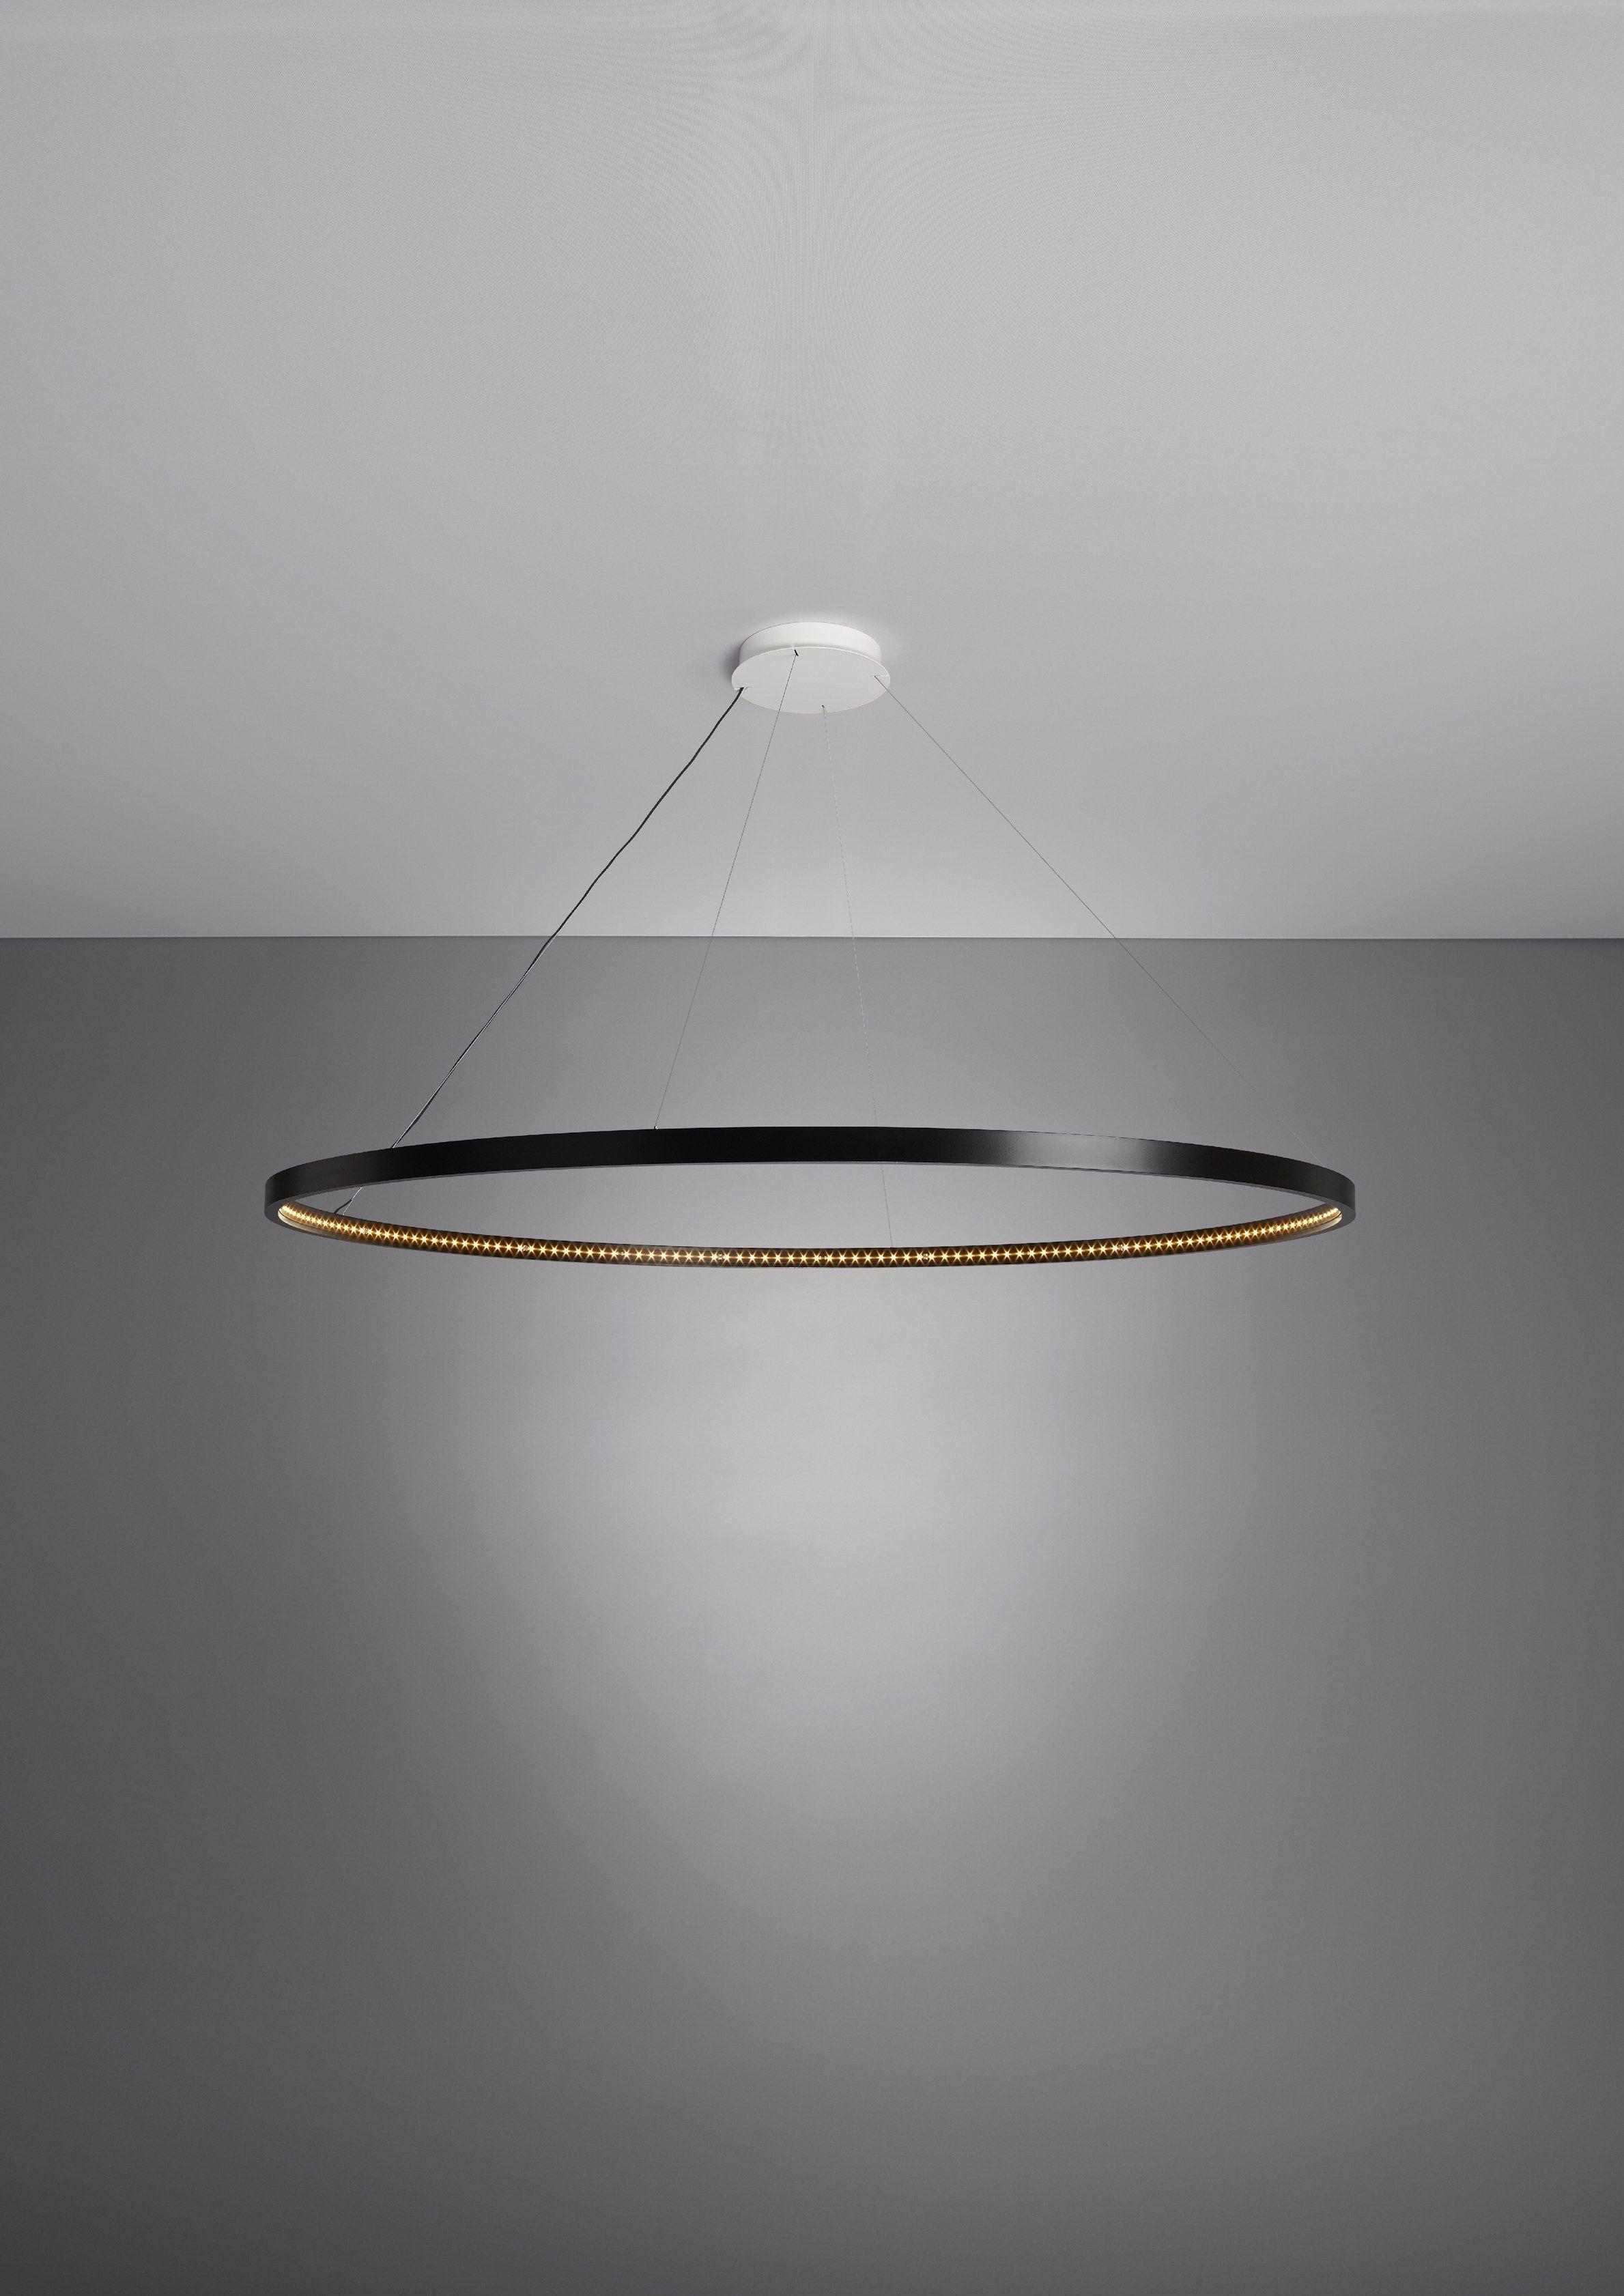 LED direct-indirect light pendant lamp OMEGA 120 by Le ...